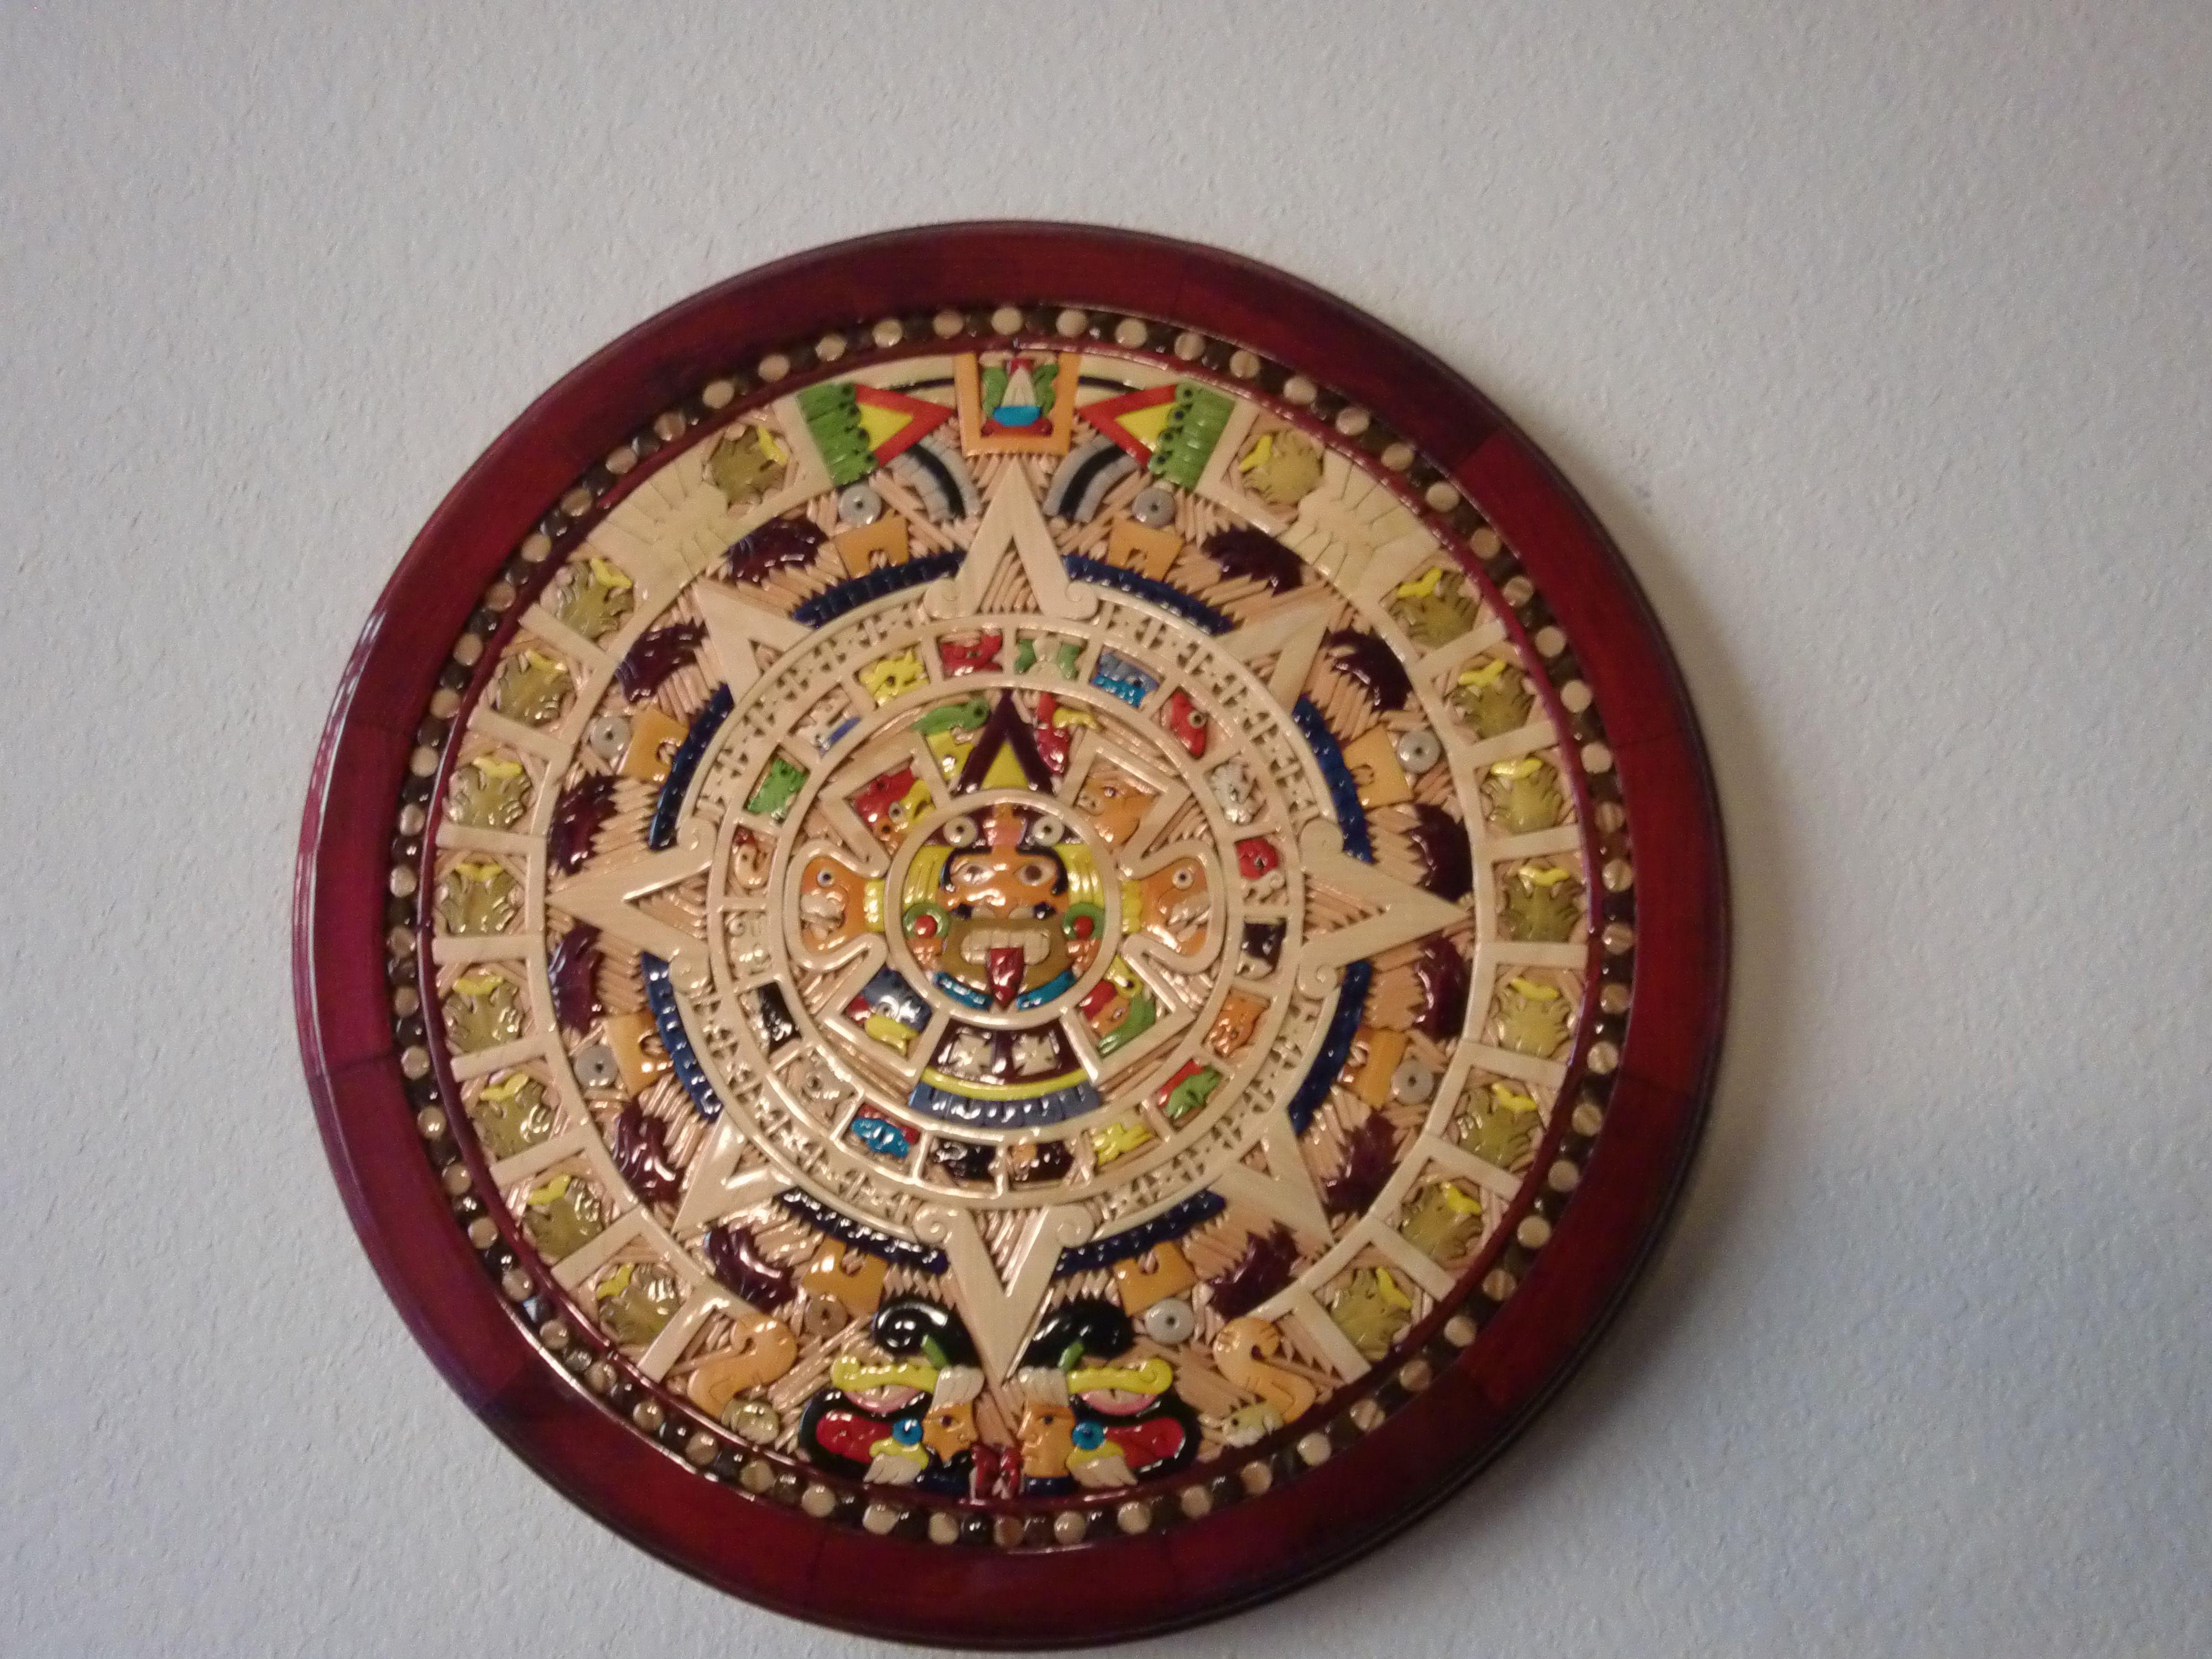 Wooden Aztec calendar made by mexican artesans from Puerto Vallarta.